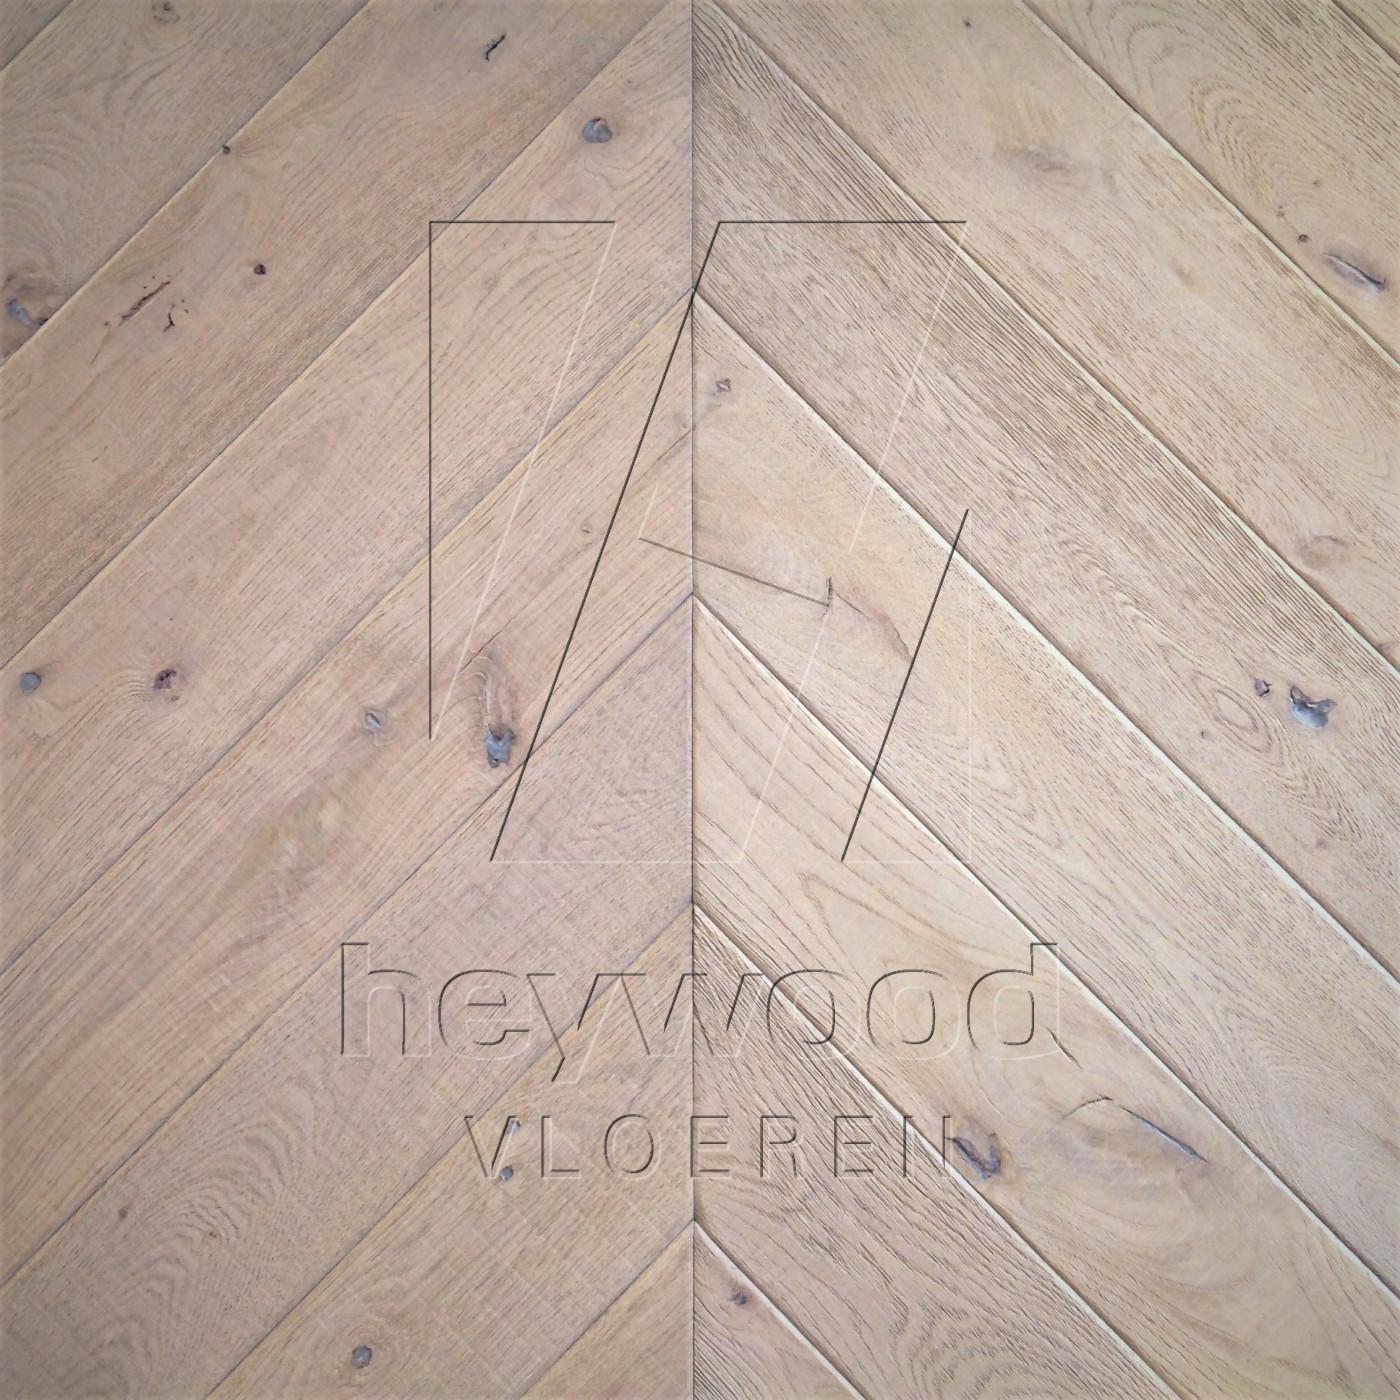 Knotting Hill Chevron 'Yosemite' in Chevron of Pattern & Panel Floors